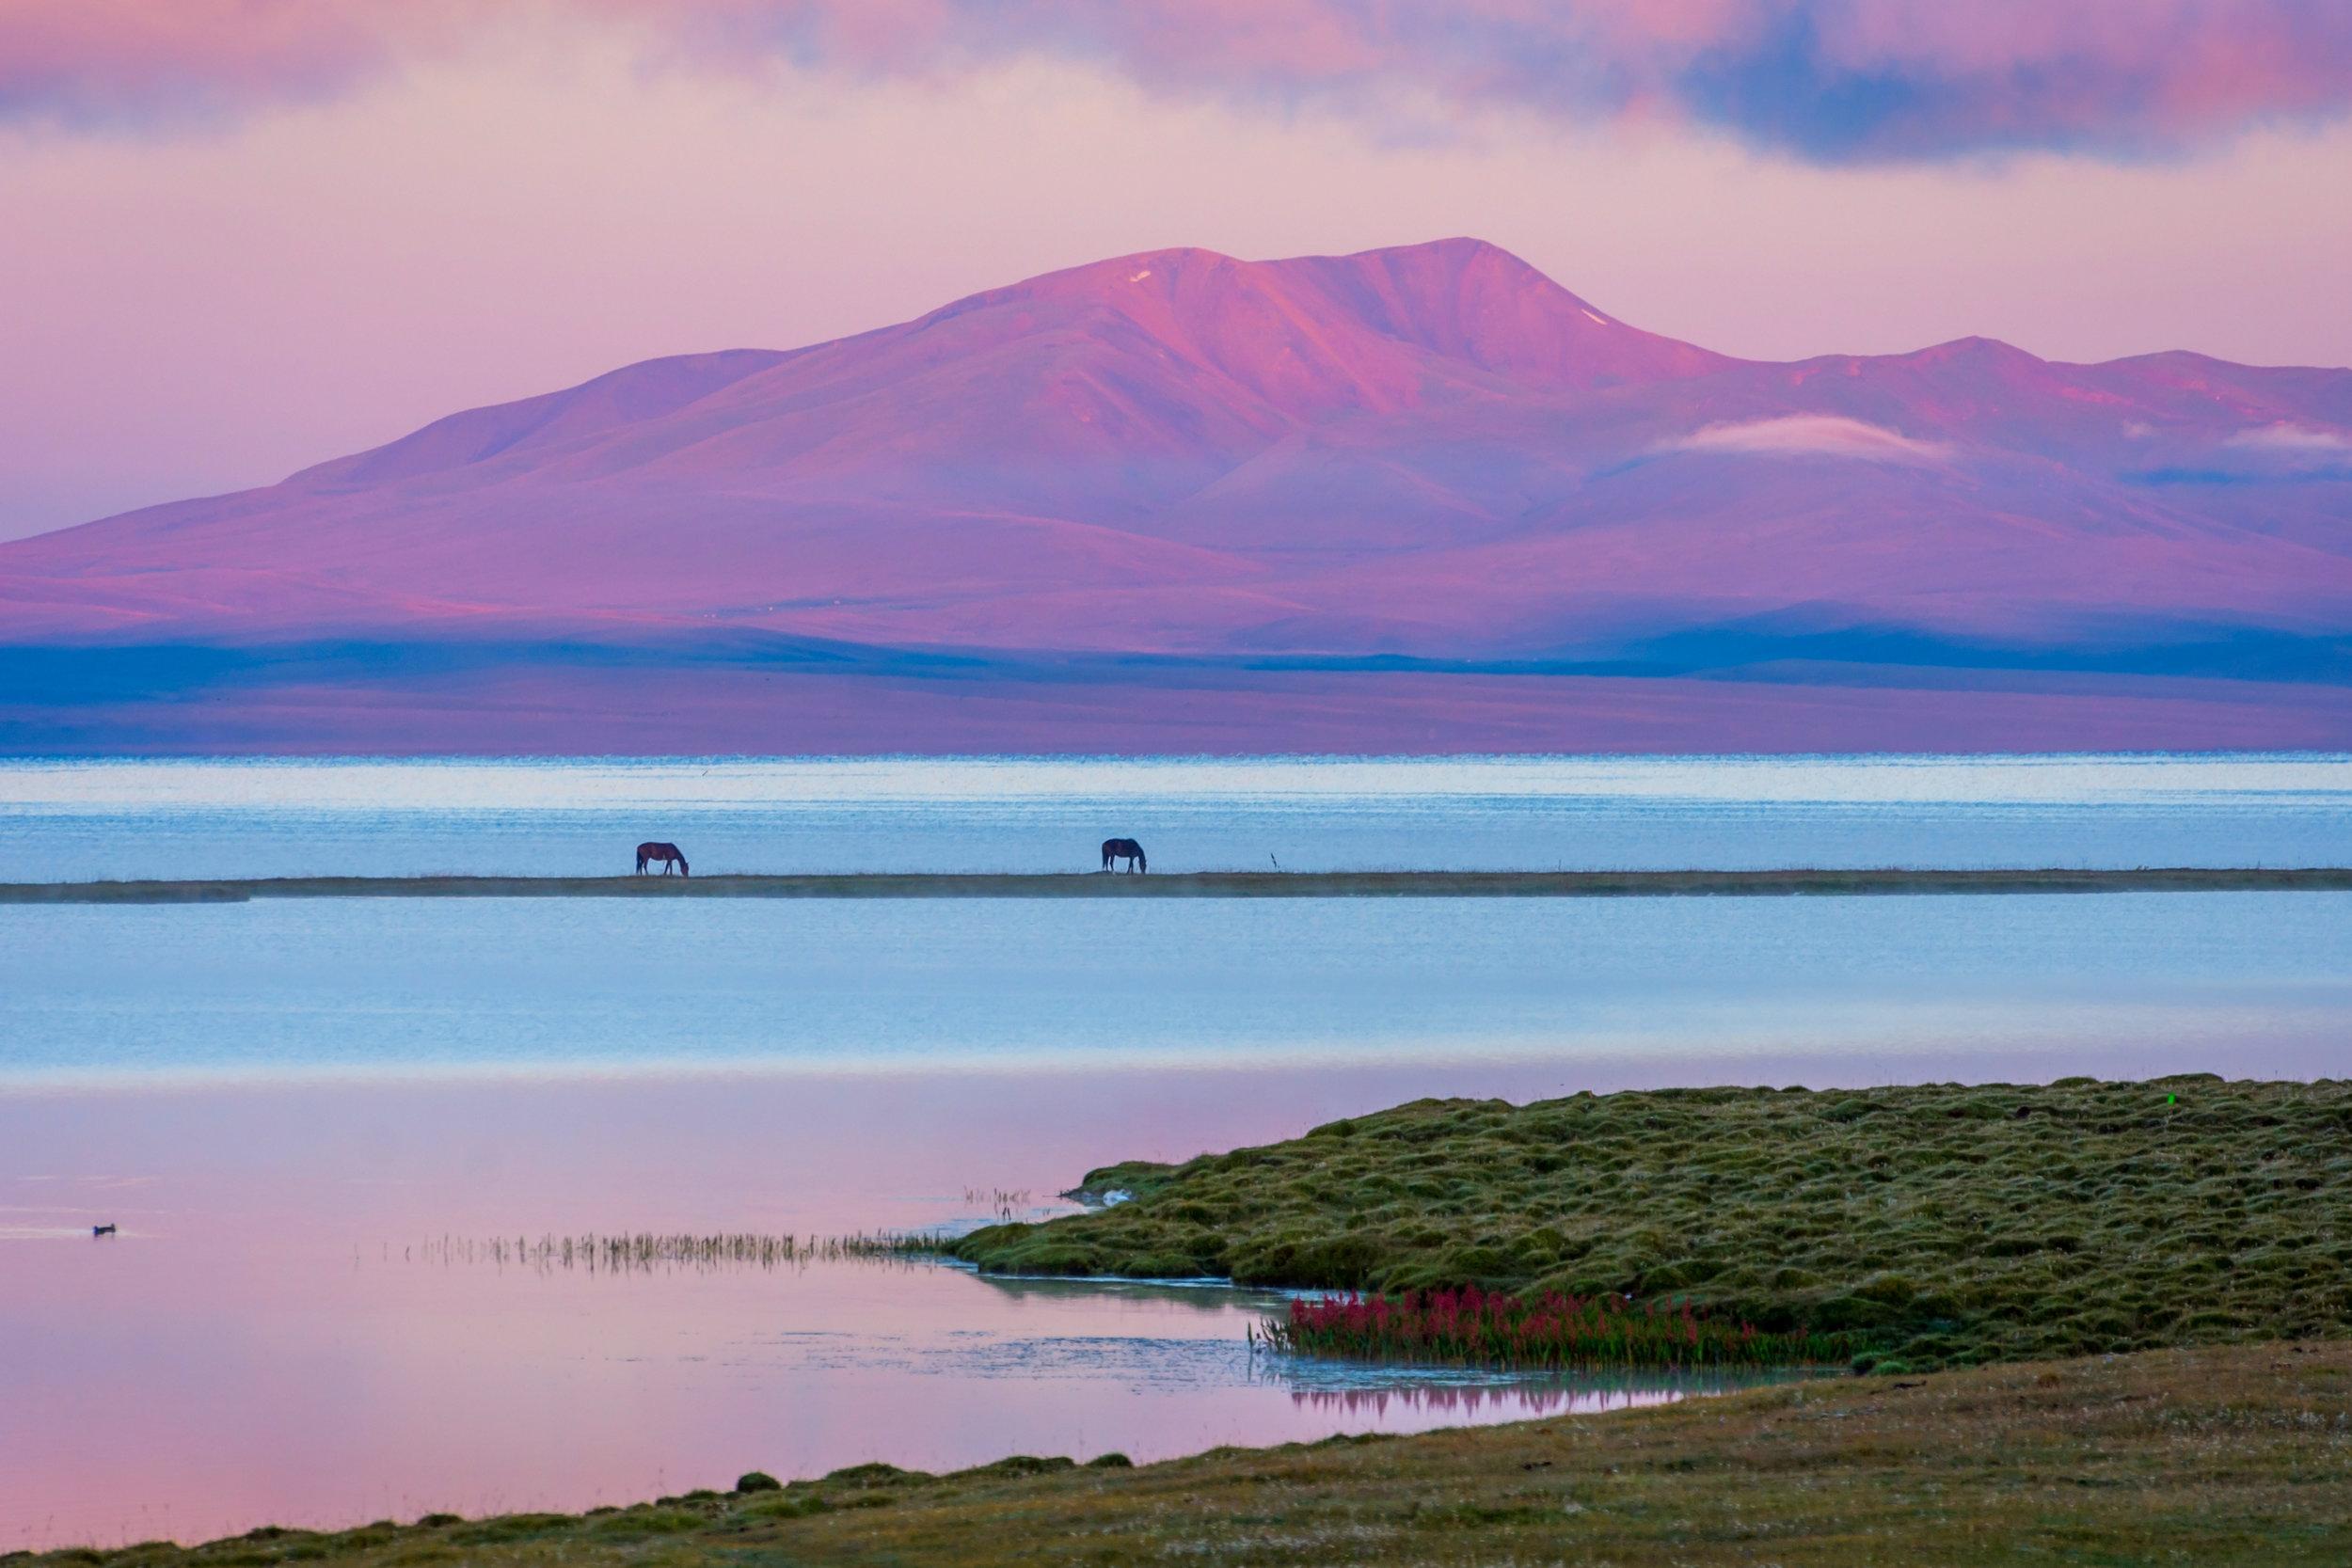 kysrgyzstan_bigstock-Song-Kul-Lake-With-Horses-In-S-216075739.jpg